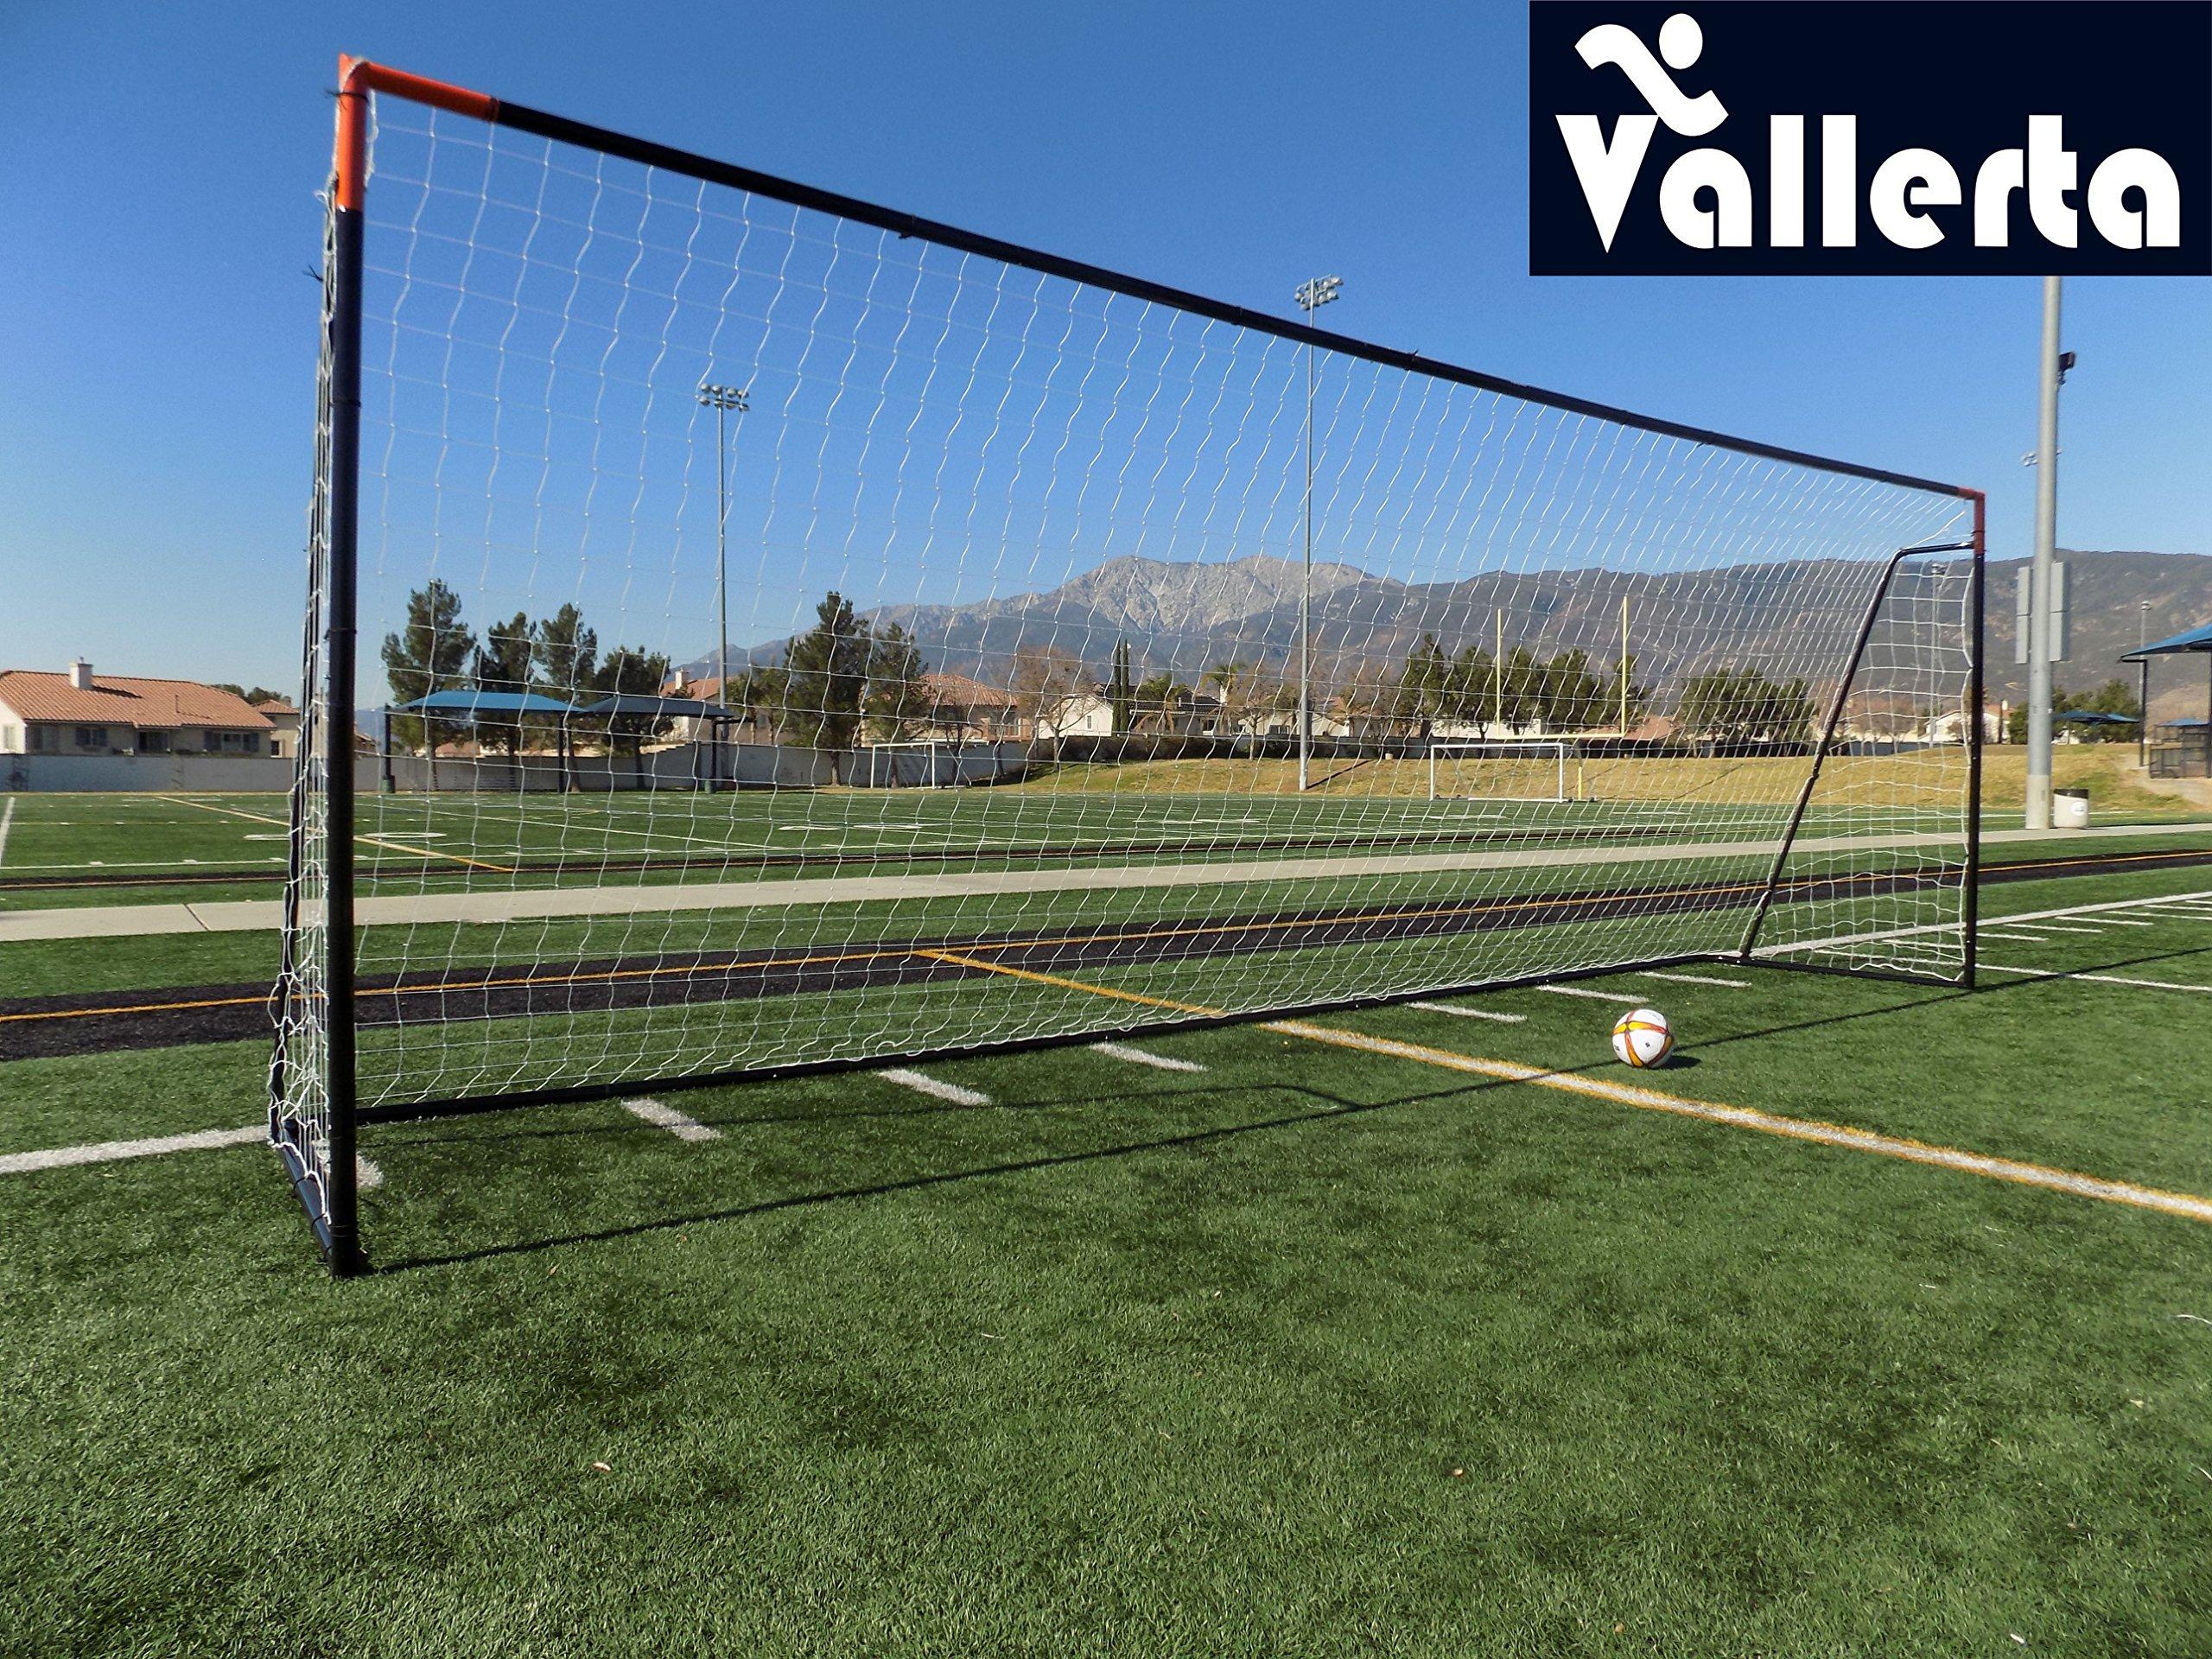 Vallerta 24 x 8 Ft.Regulation Size Soccer Goal w/Weatherproof HDPE Net. 50MM Diameter Industrial Grade Blk/Org Powder Coated Galvanized Steel. Portable 8x24 Foot Training Aid(1Net) ONE Year Warranty!